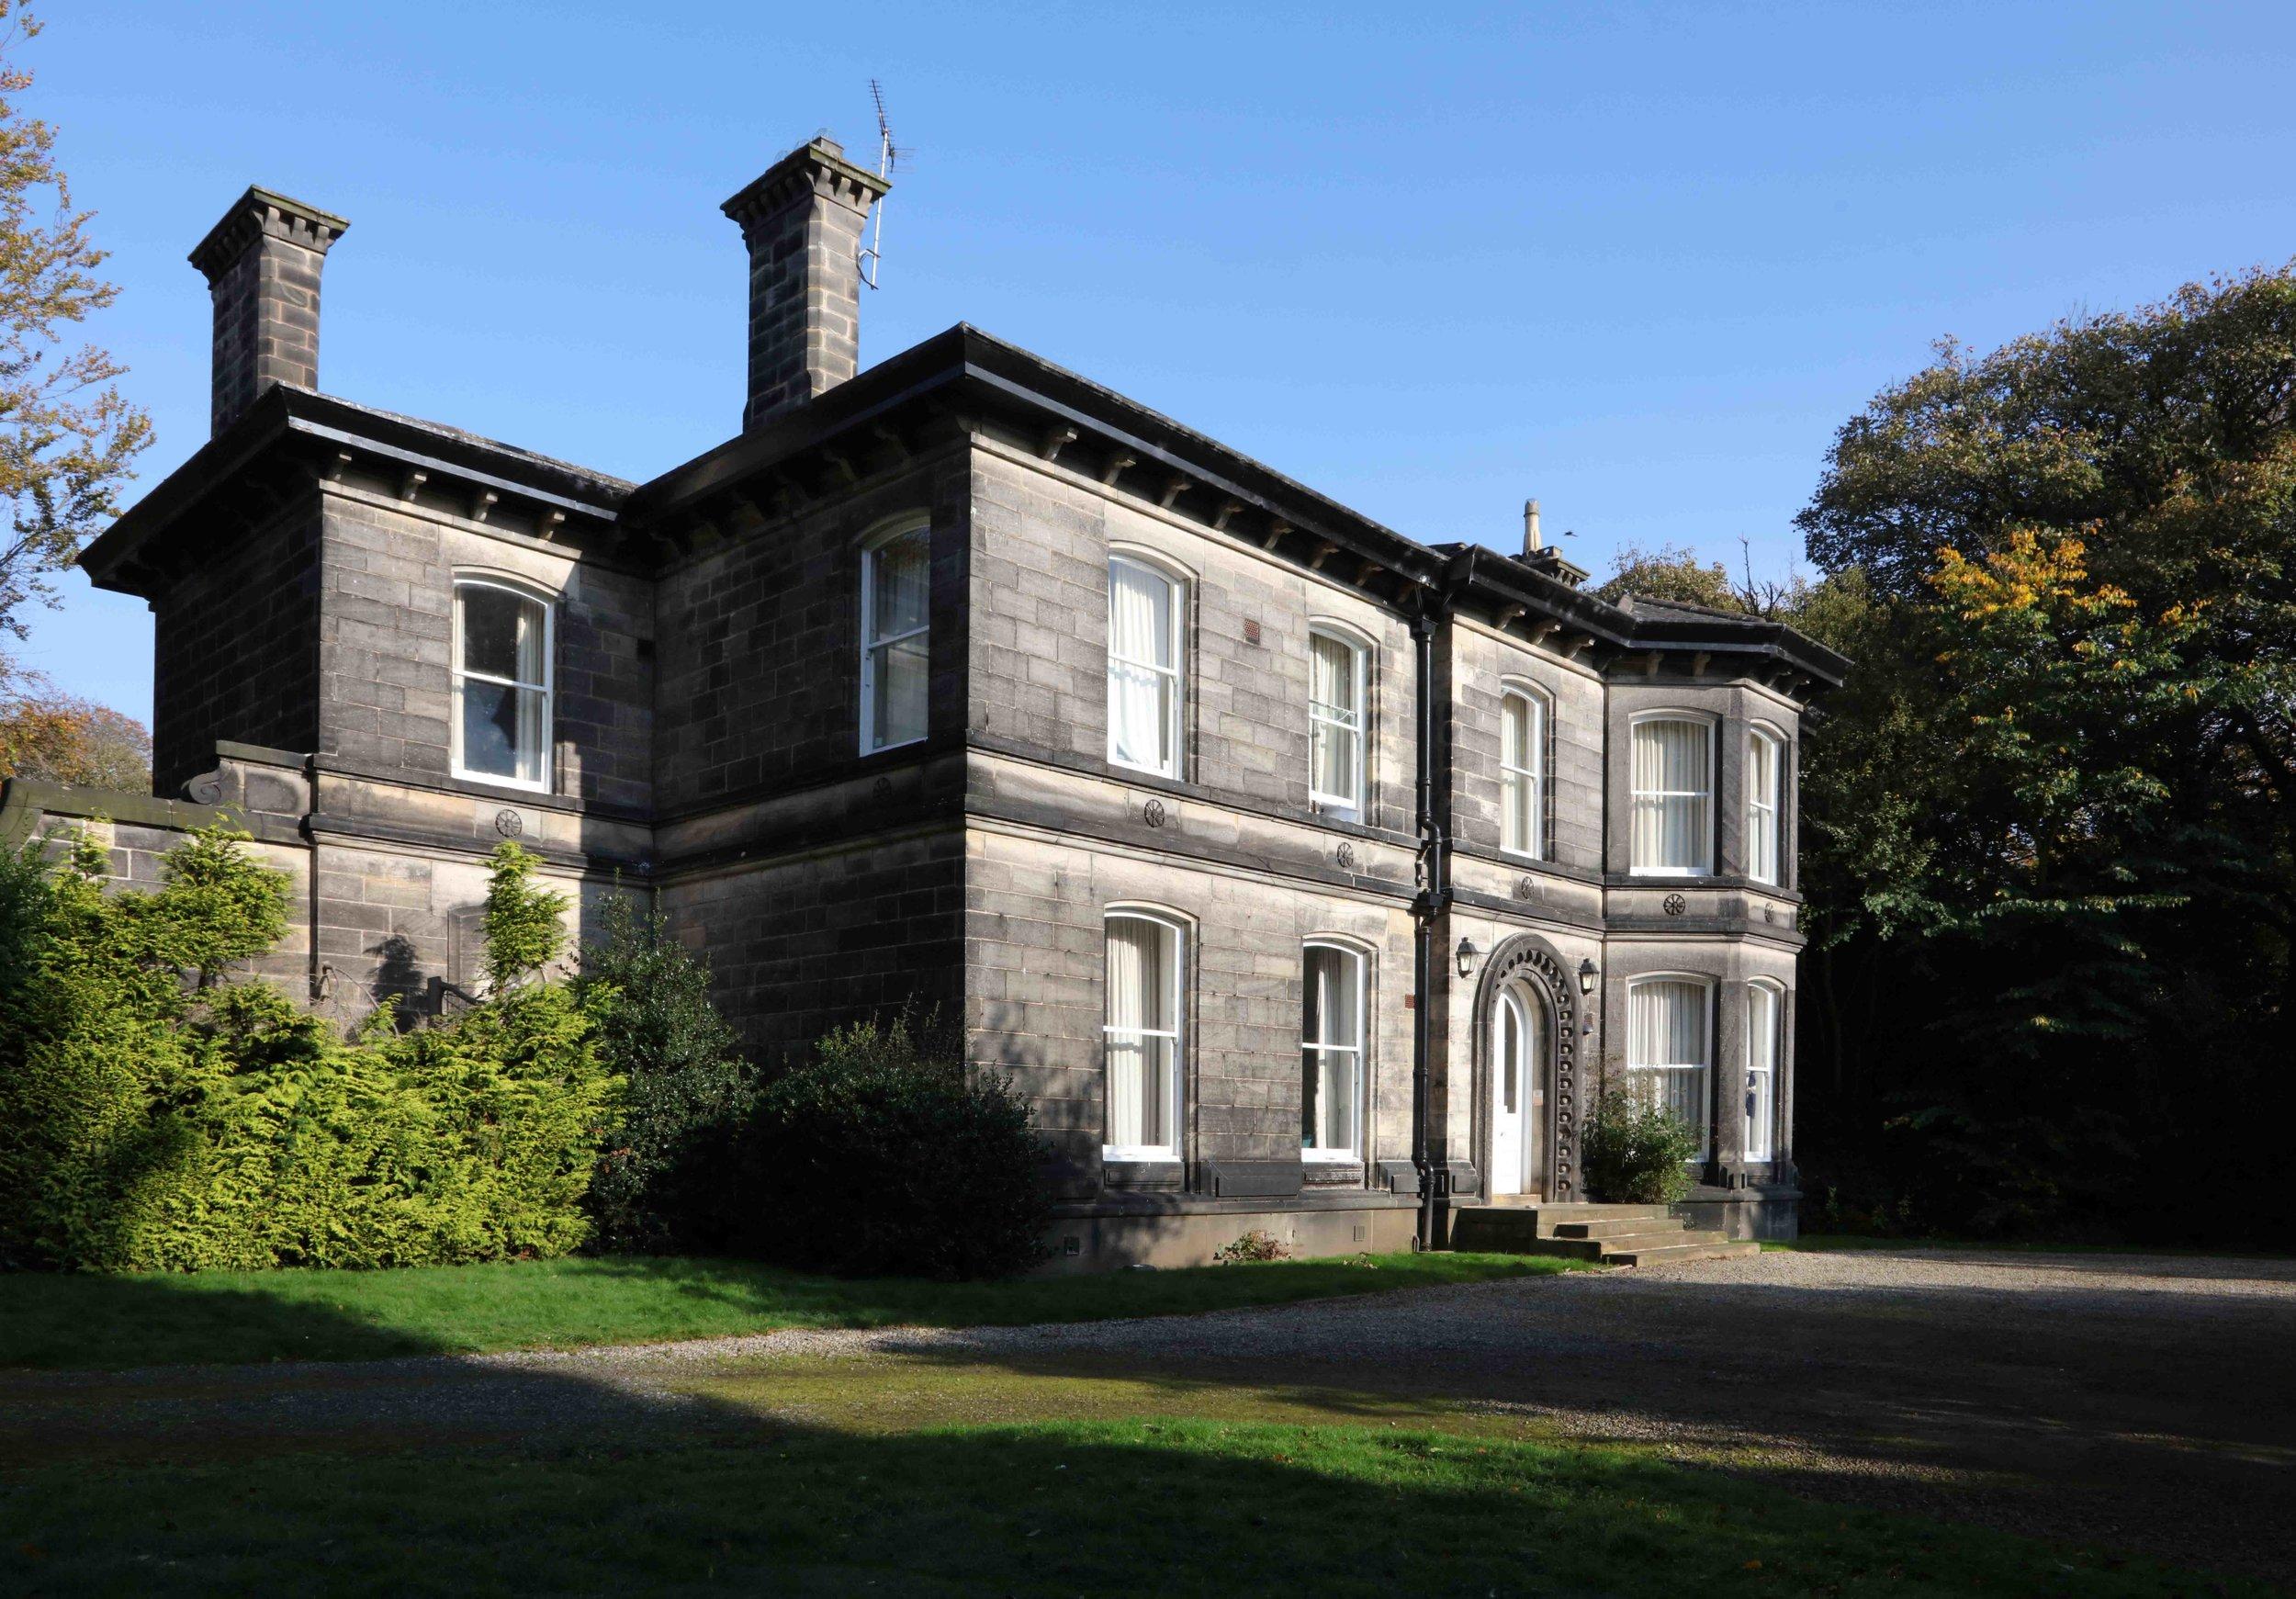 18  Oxley Residences, formerly Bardon Grange © JHJ